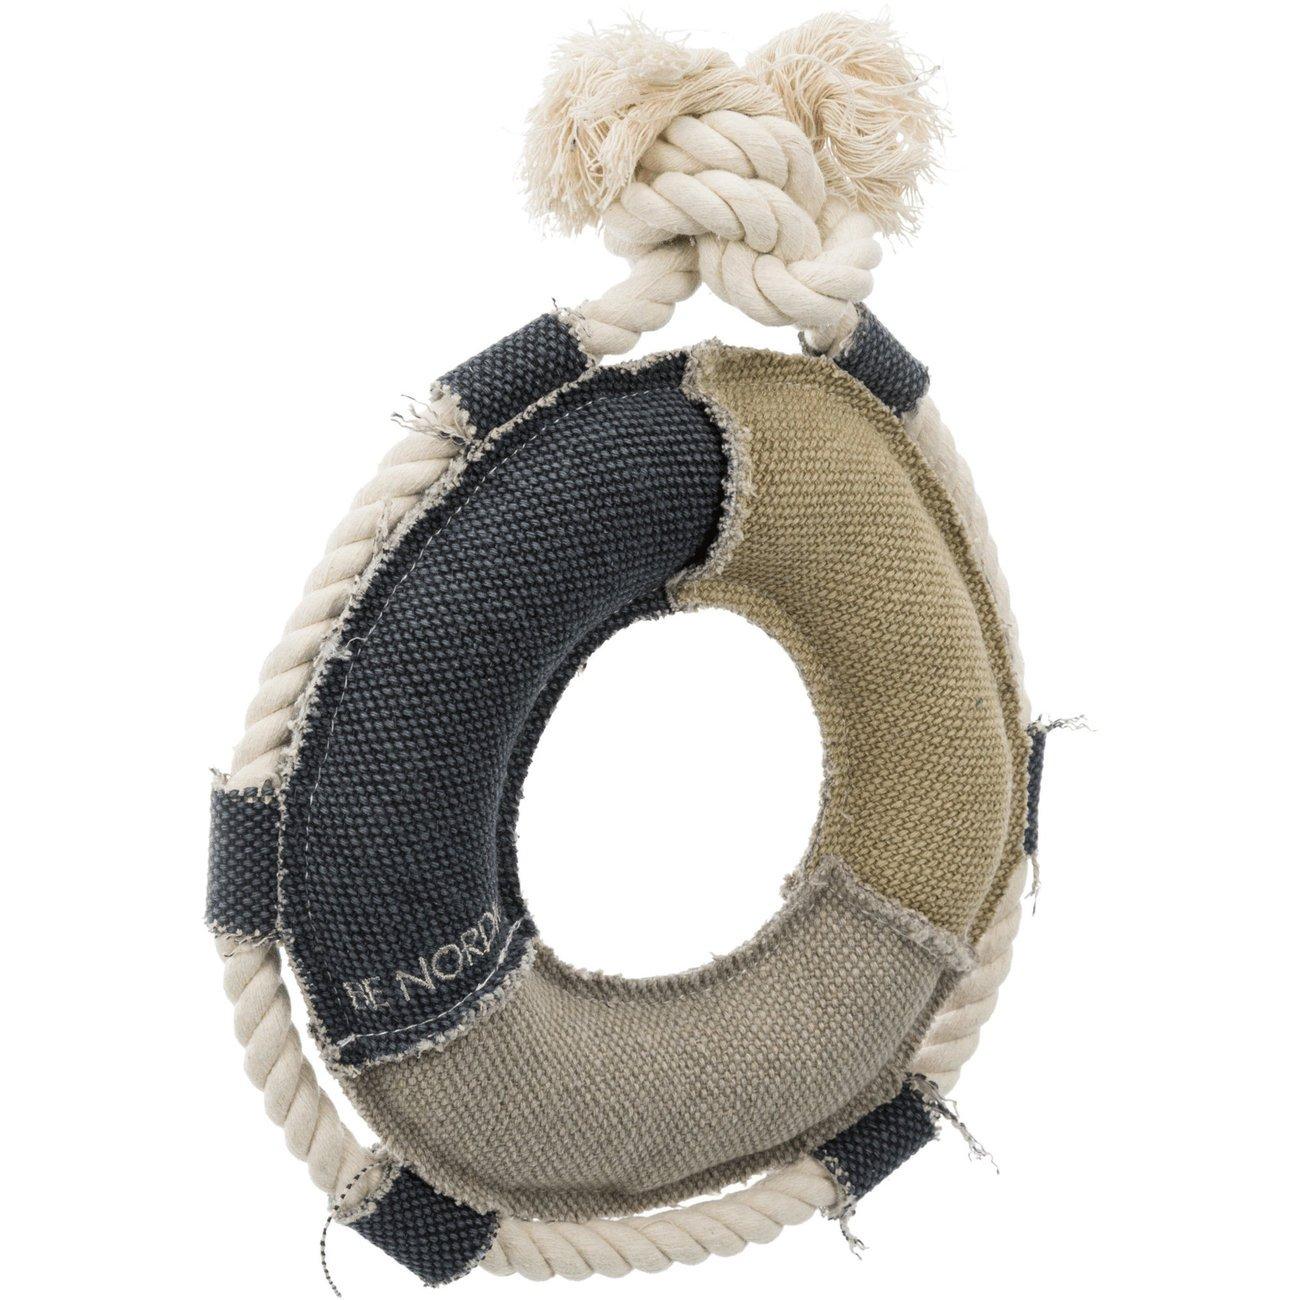 Trixie BE NORDIC Rettungsring, Hundespielzeug 35652, Bild 3